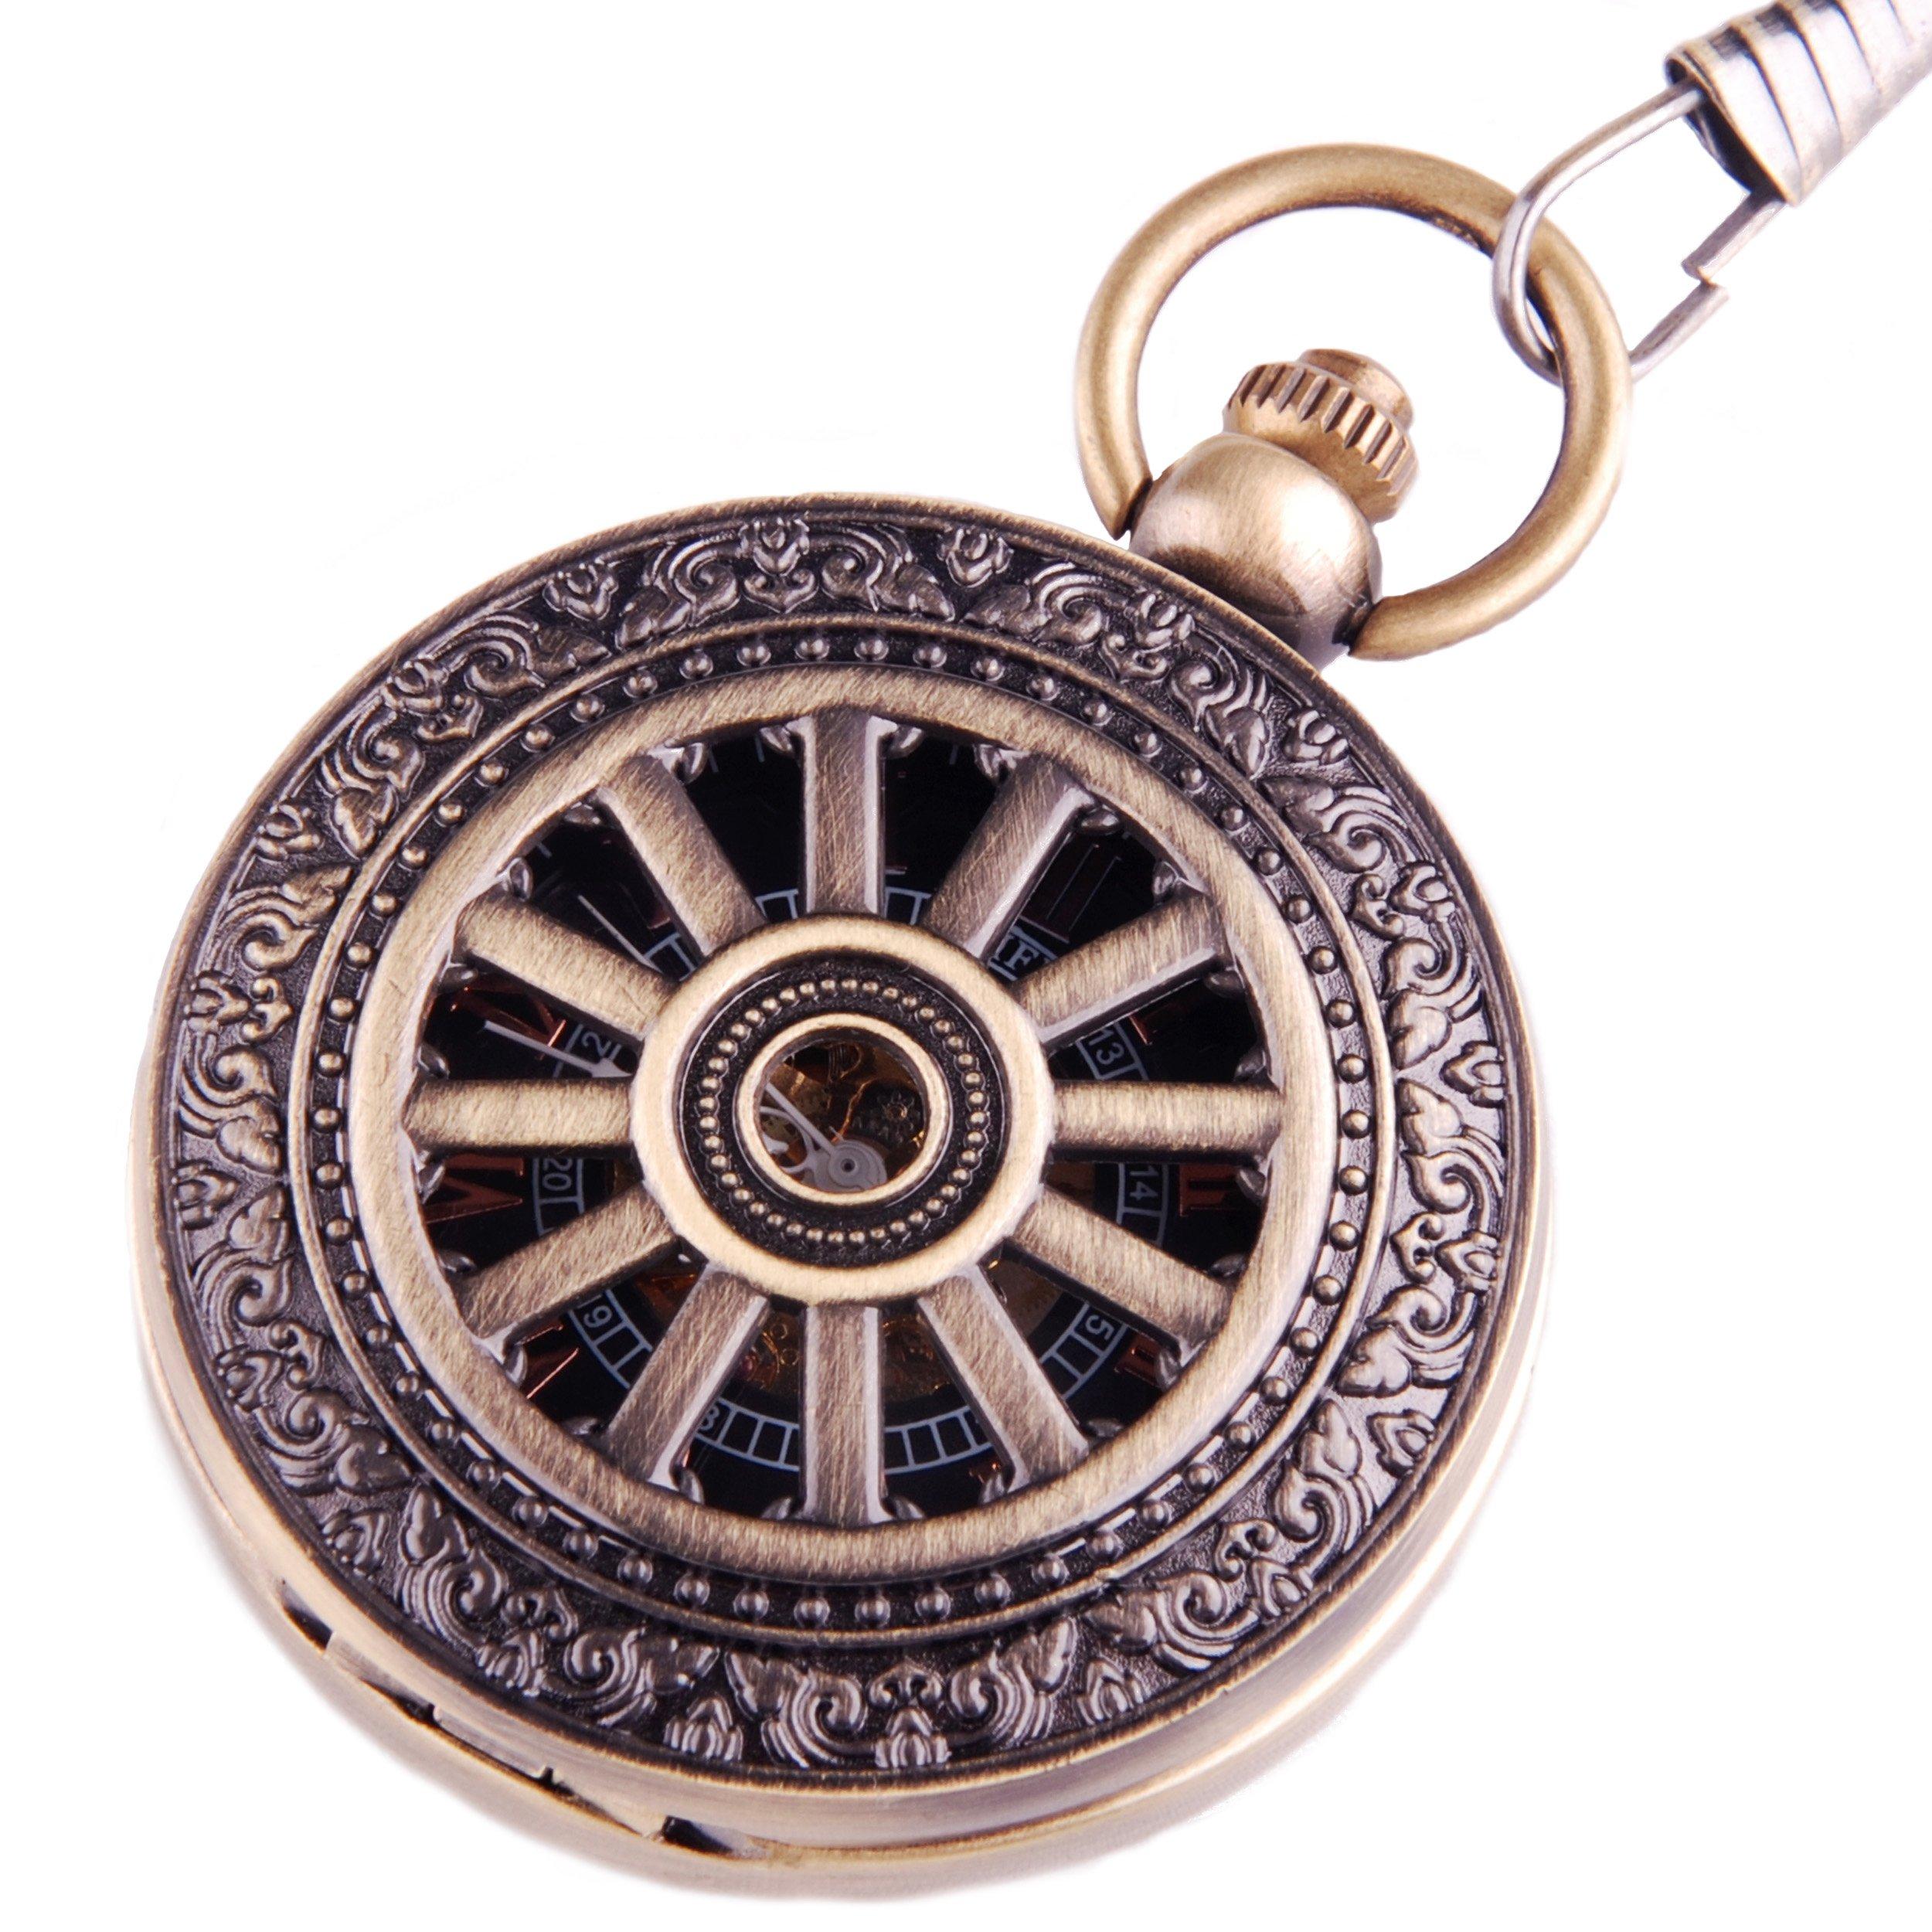 CDM product Pocket Watch Classic Skeleton Mechanical Movement Hand Wind Roman Numeral Wheel Motif Half Hunter PW-68 big image